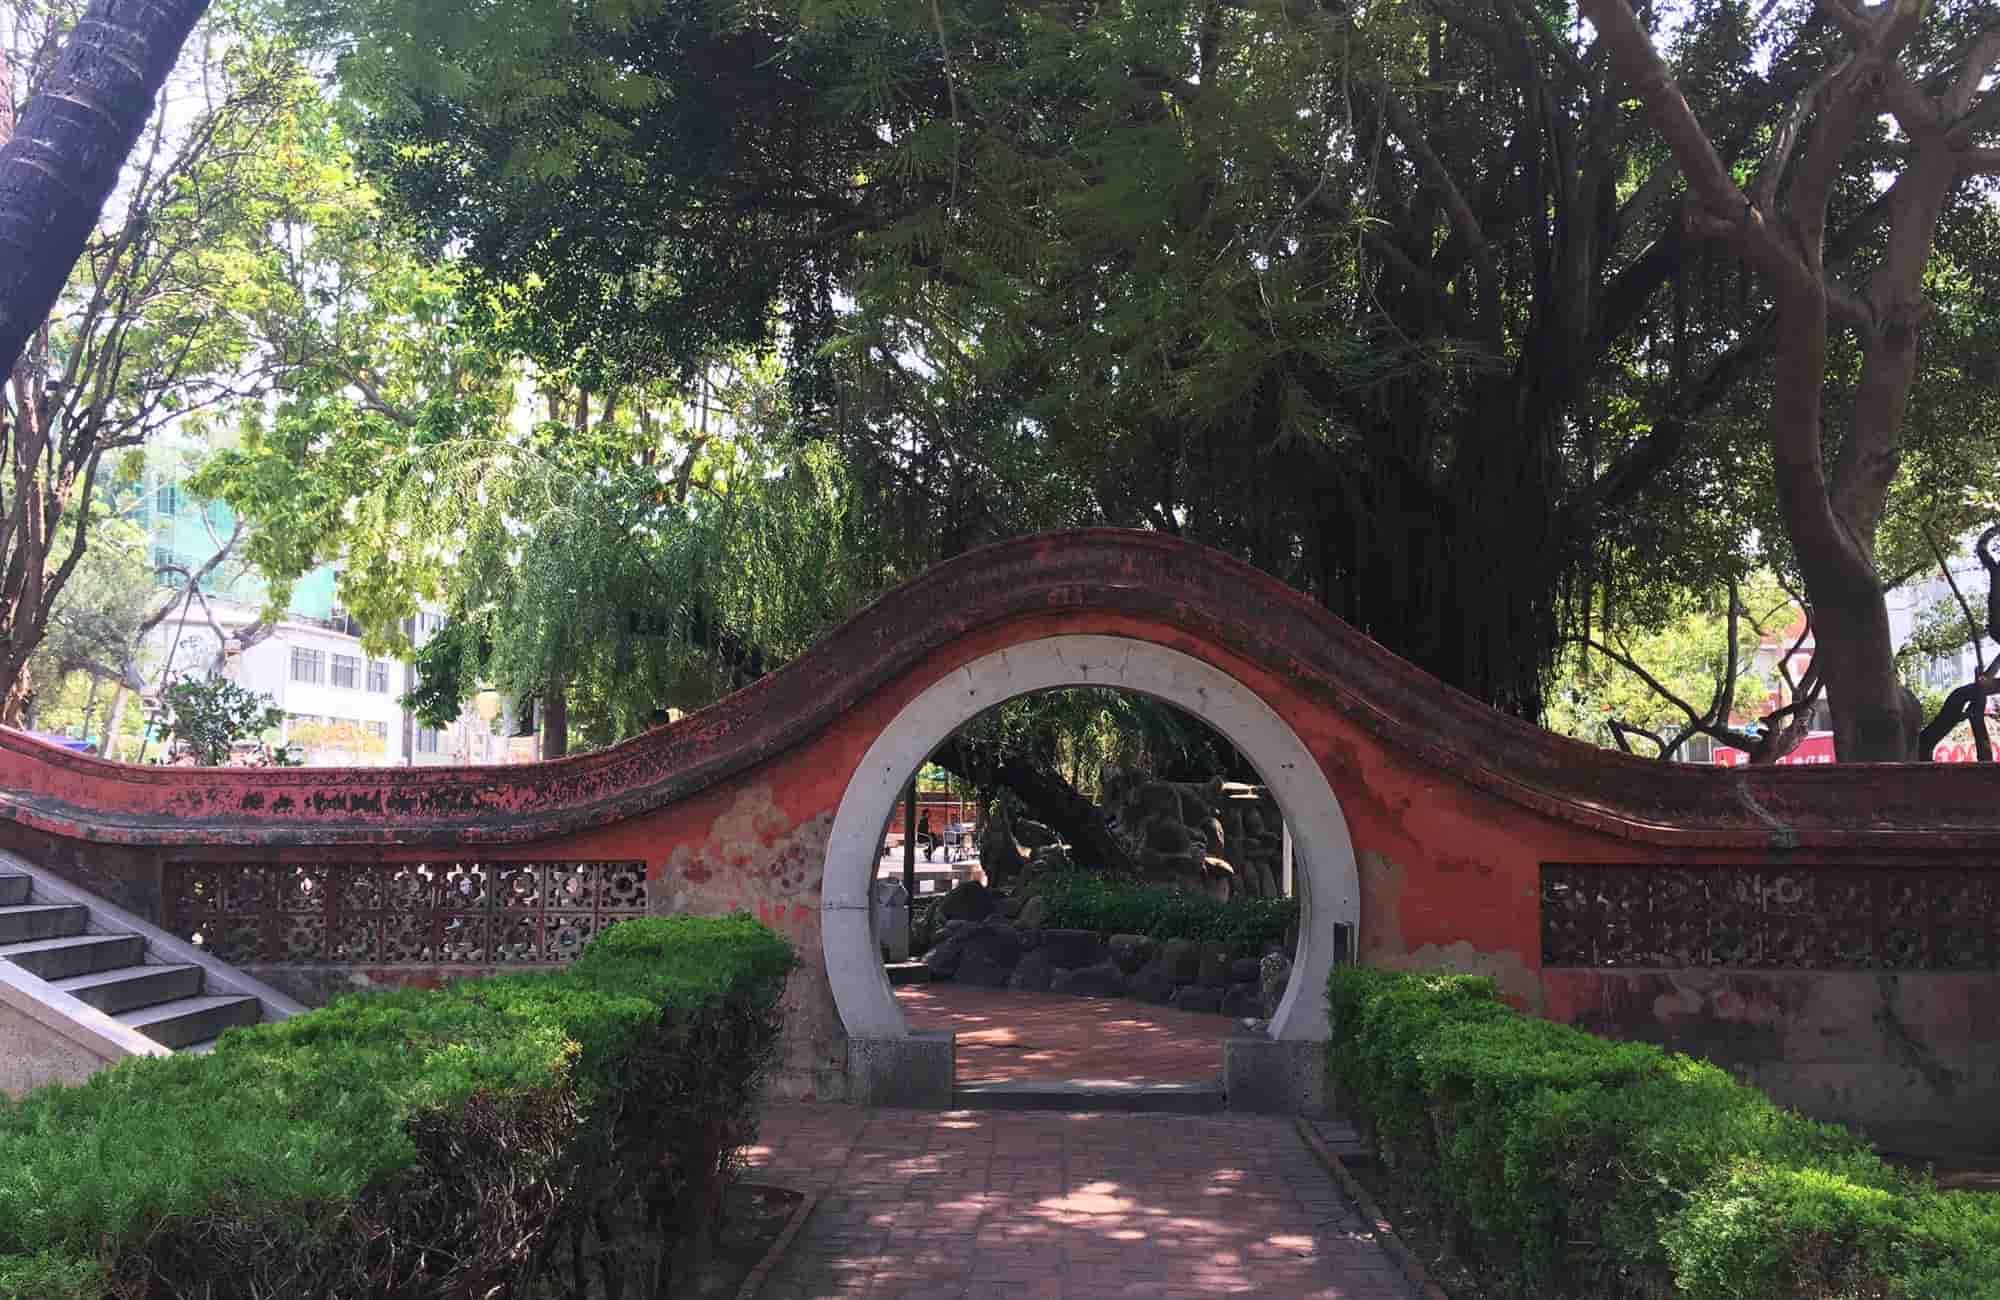 Voyage à Taïwan - Fort provinta - Amplitudes